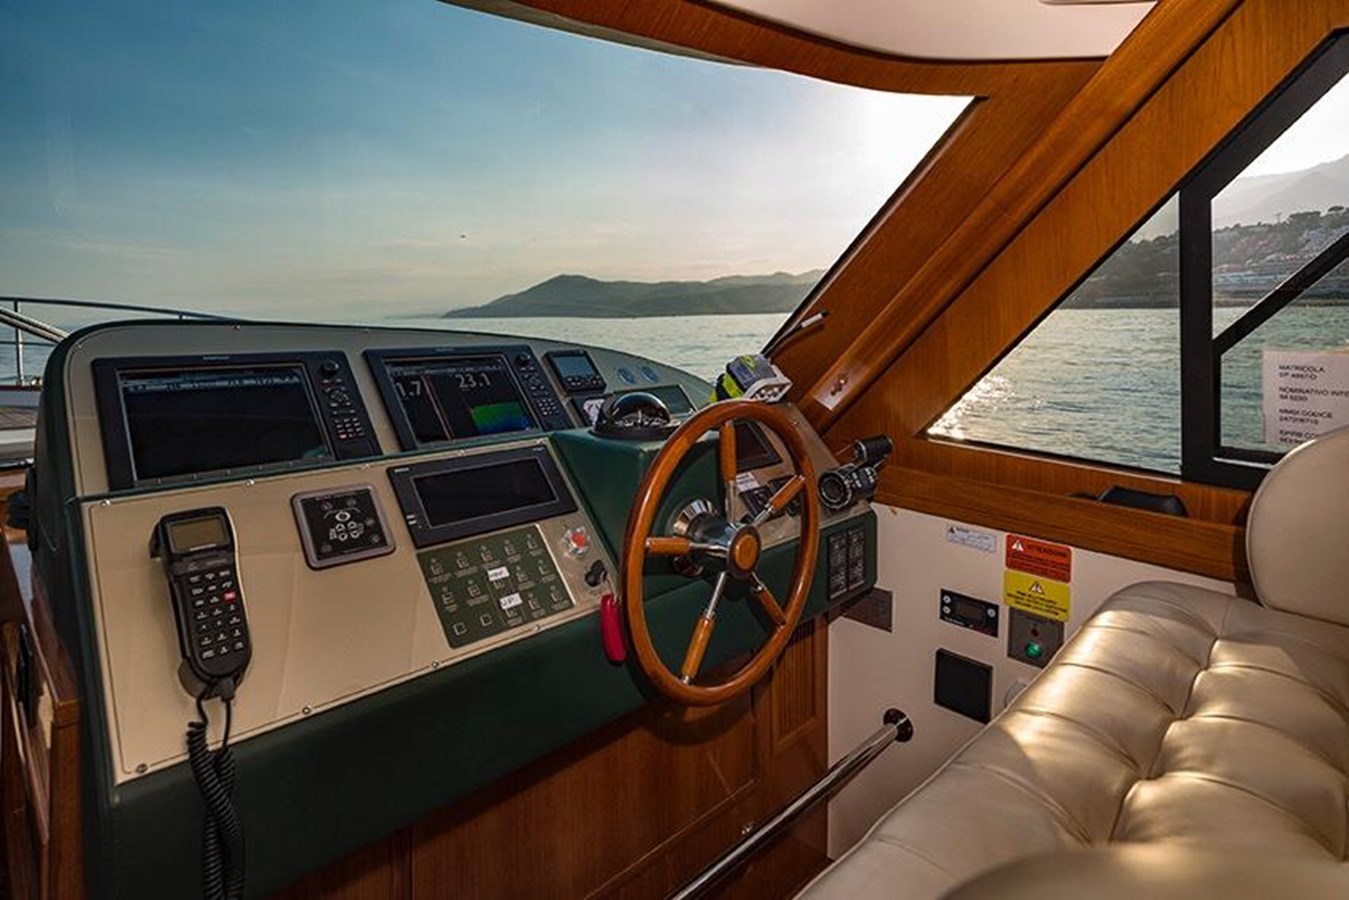 IMG-20200304-WA0026 2011 ABATI YACHTS kEYPORT 60 Motor Yacht 2879786